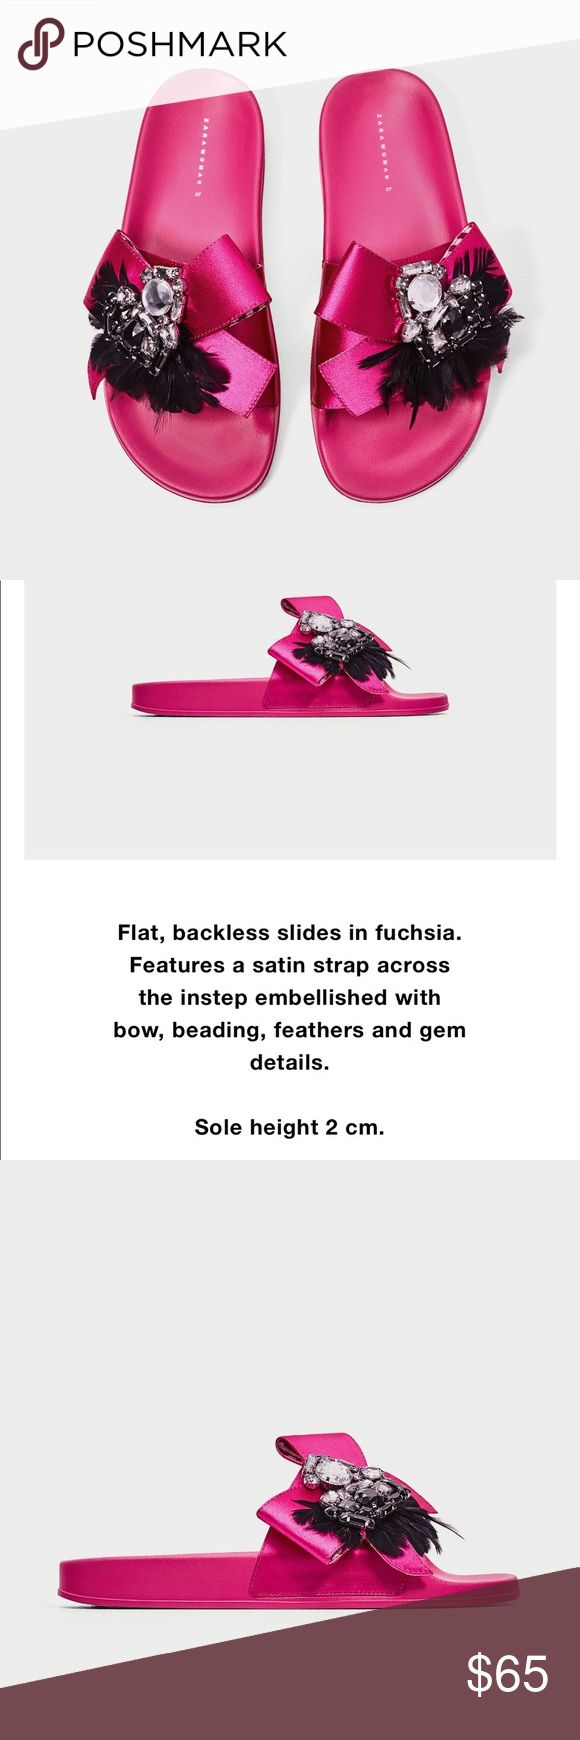 Zara hot pink slides flip-flop sandals. New! Hot pink satin slides with feather and gem details. Brand new with dust bag! Zara Shoes Sandals